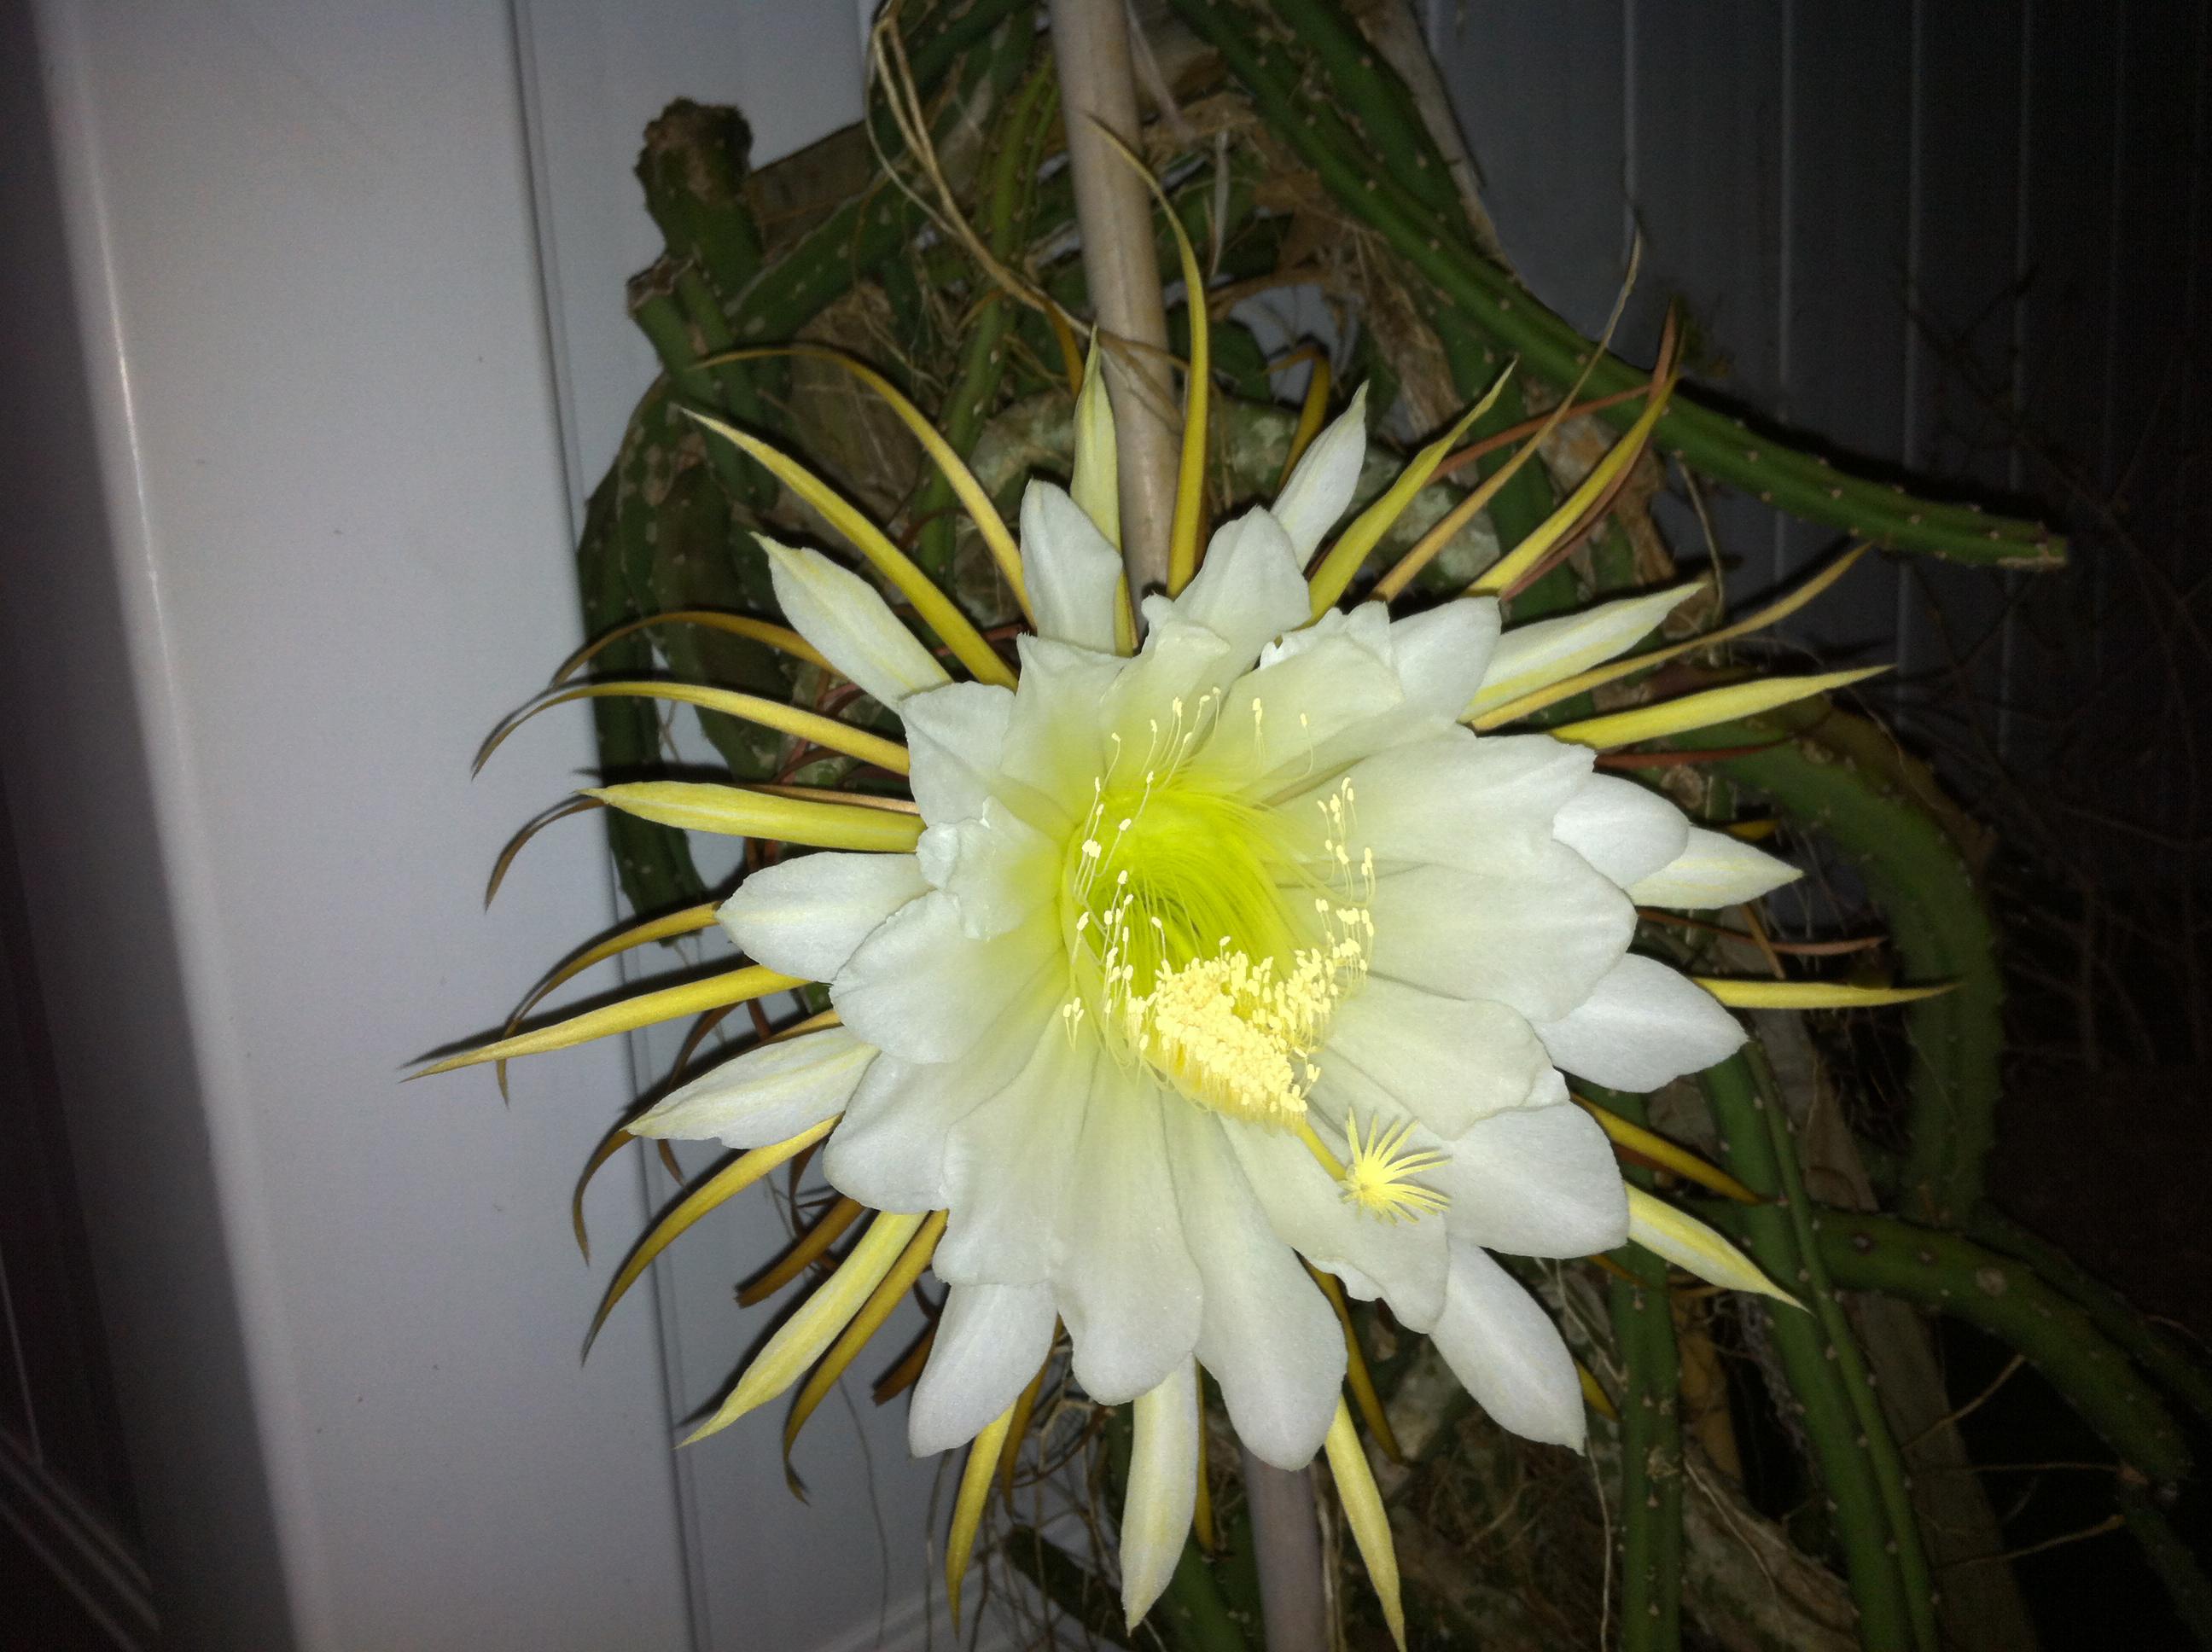 Gigantic Night Blooming Cactus Flower